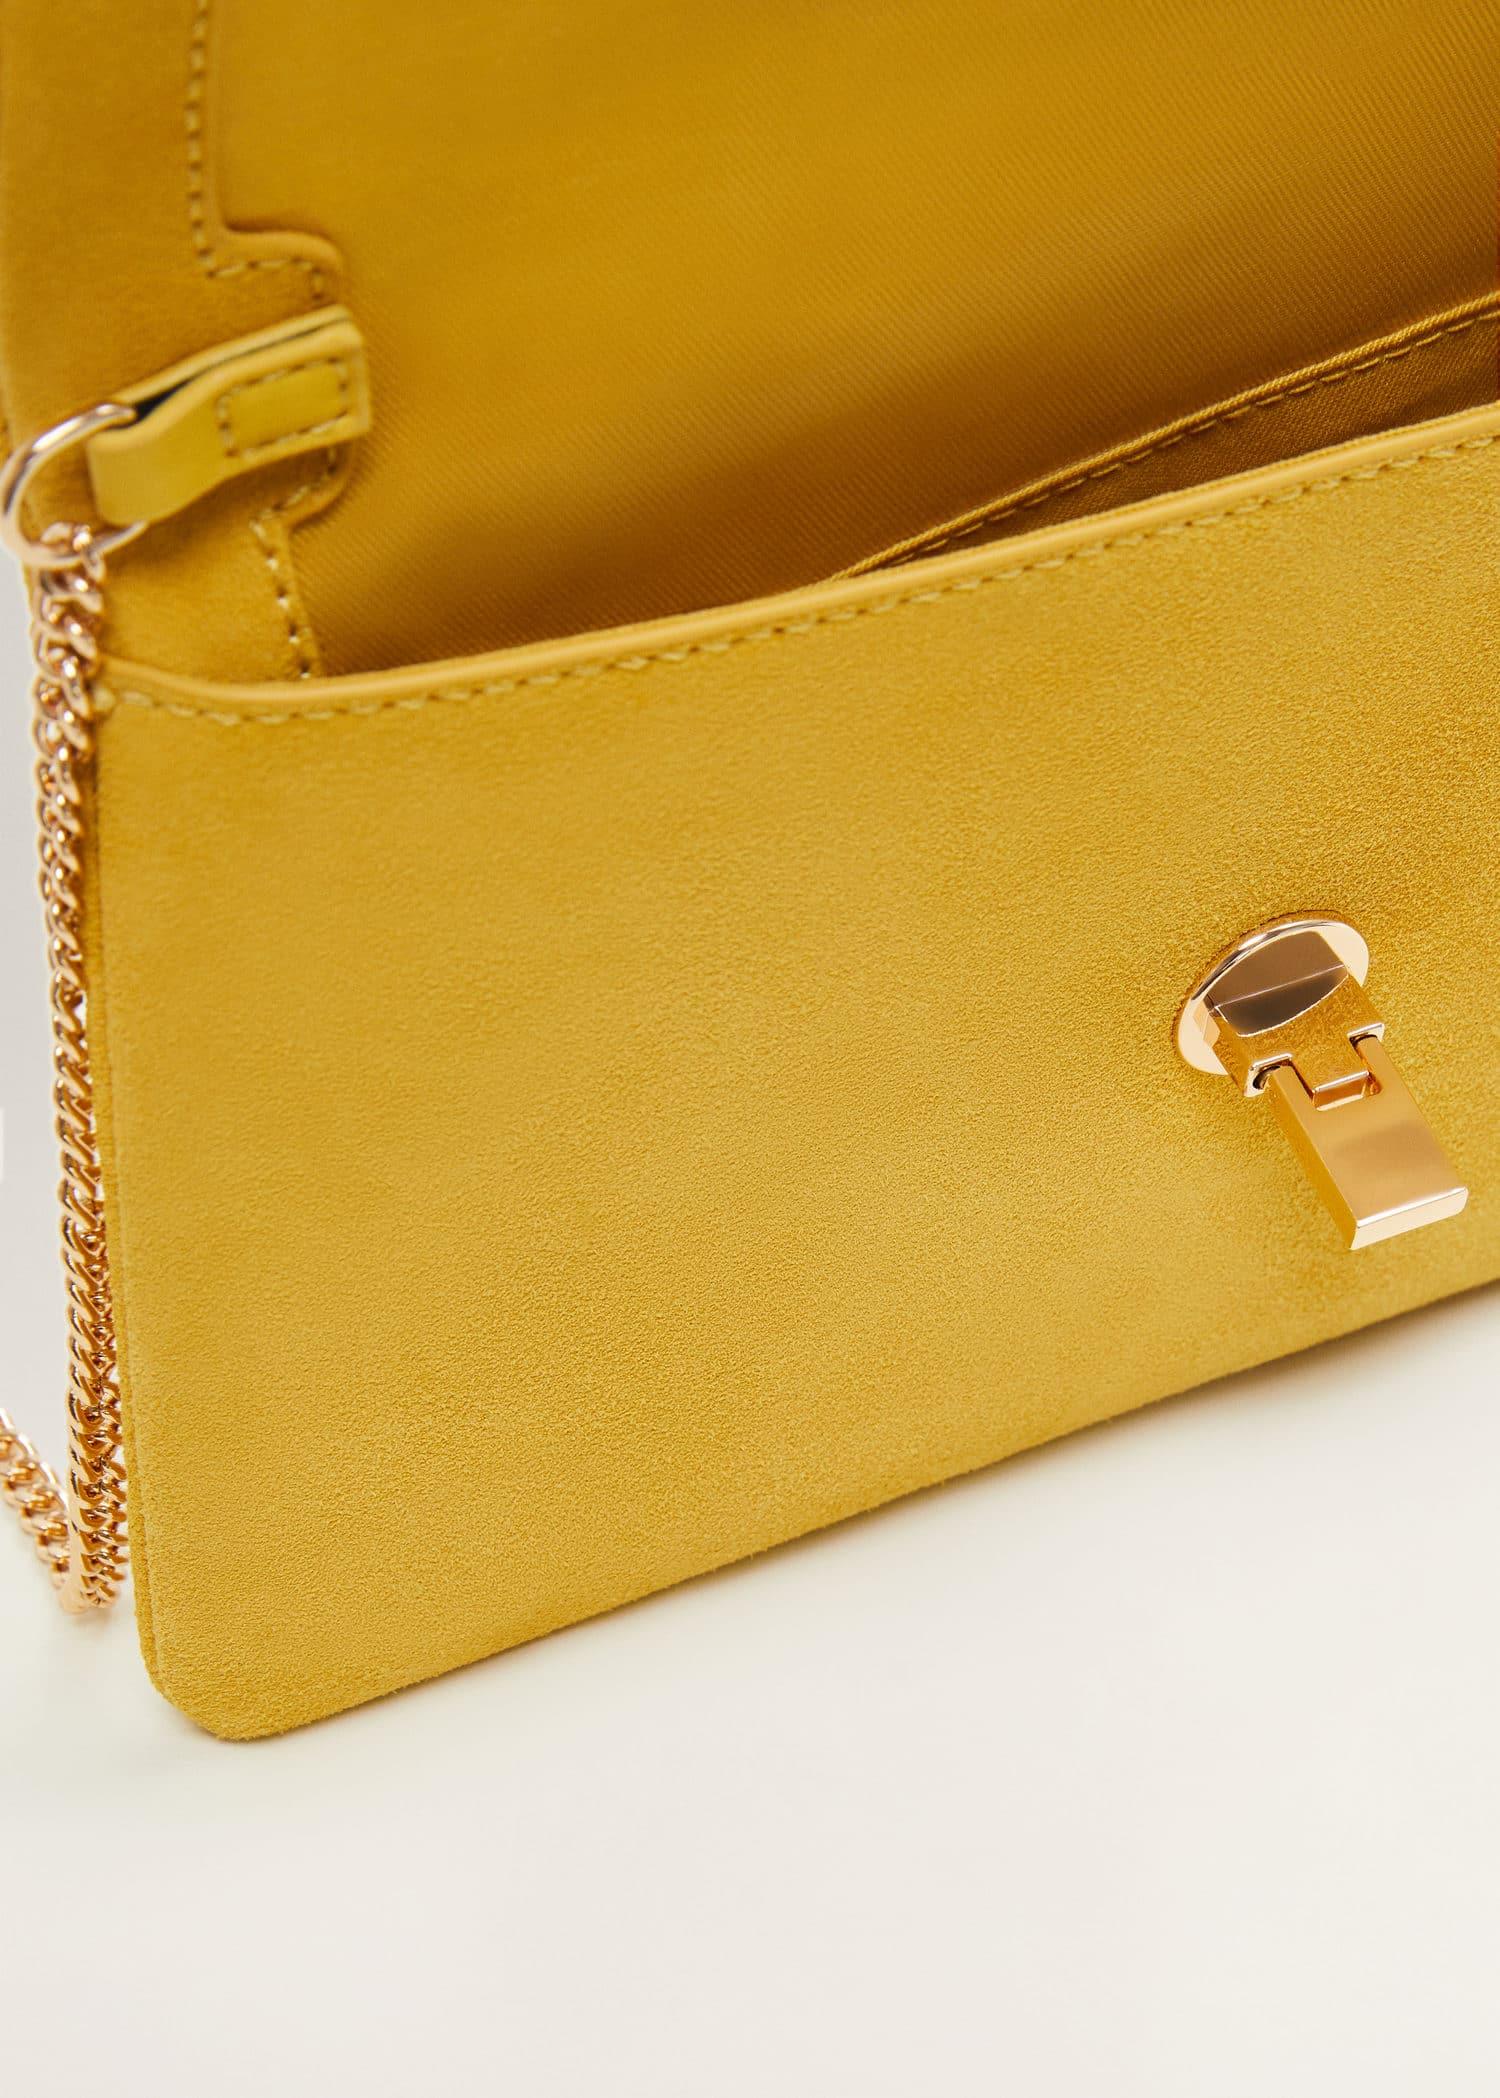 deeef22748715 Modalite - Mango Deri zarf çanta